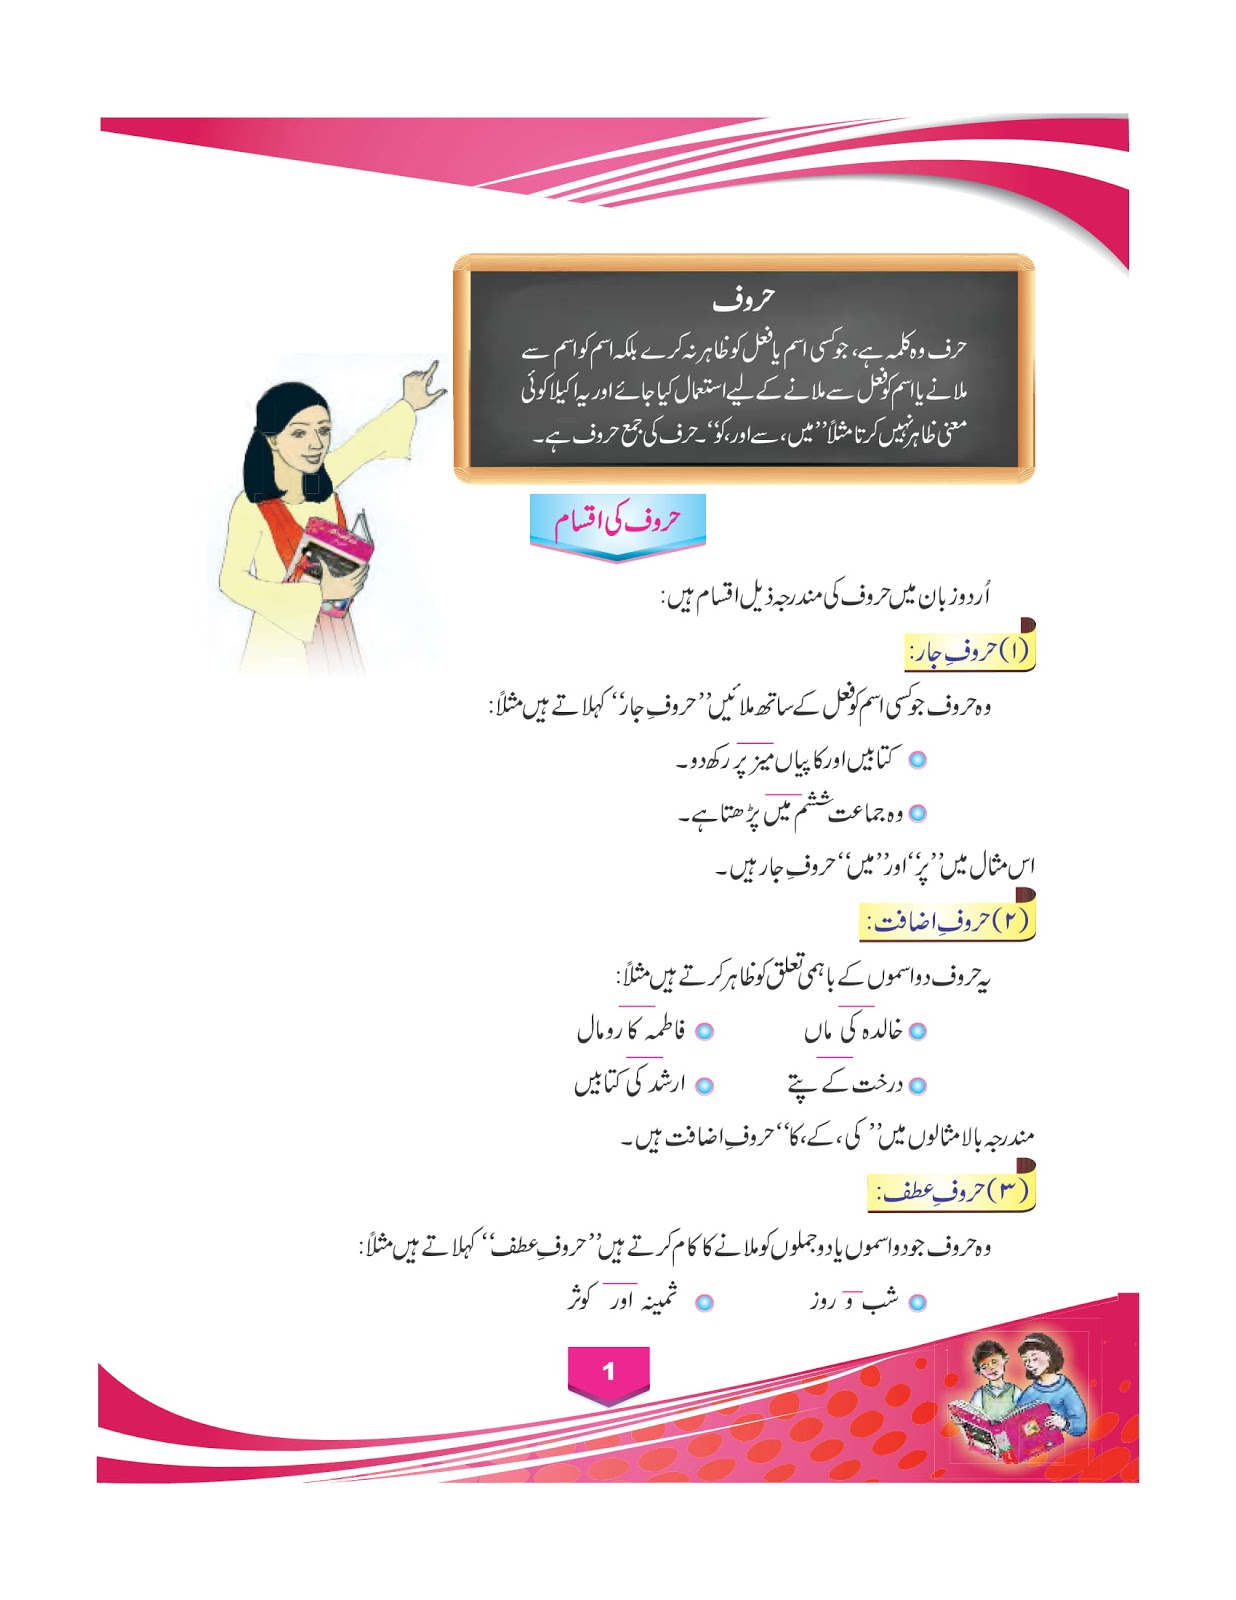 Urdu Grammar Book For Class 5th 6th 7th And 8th